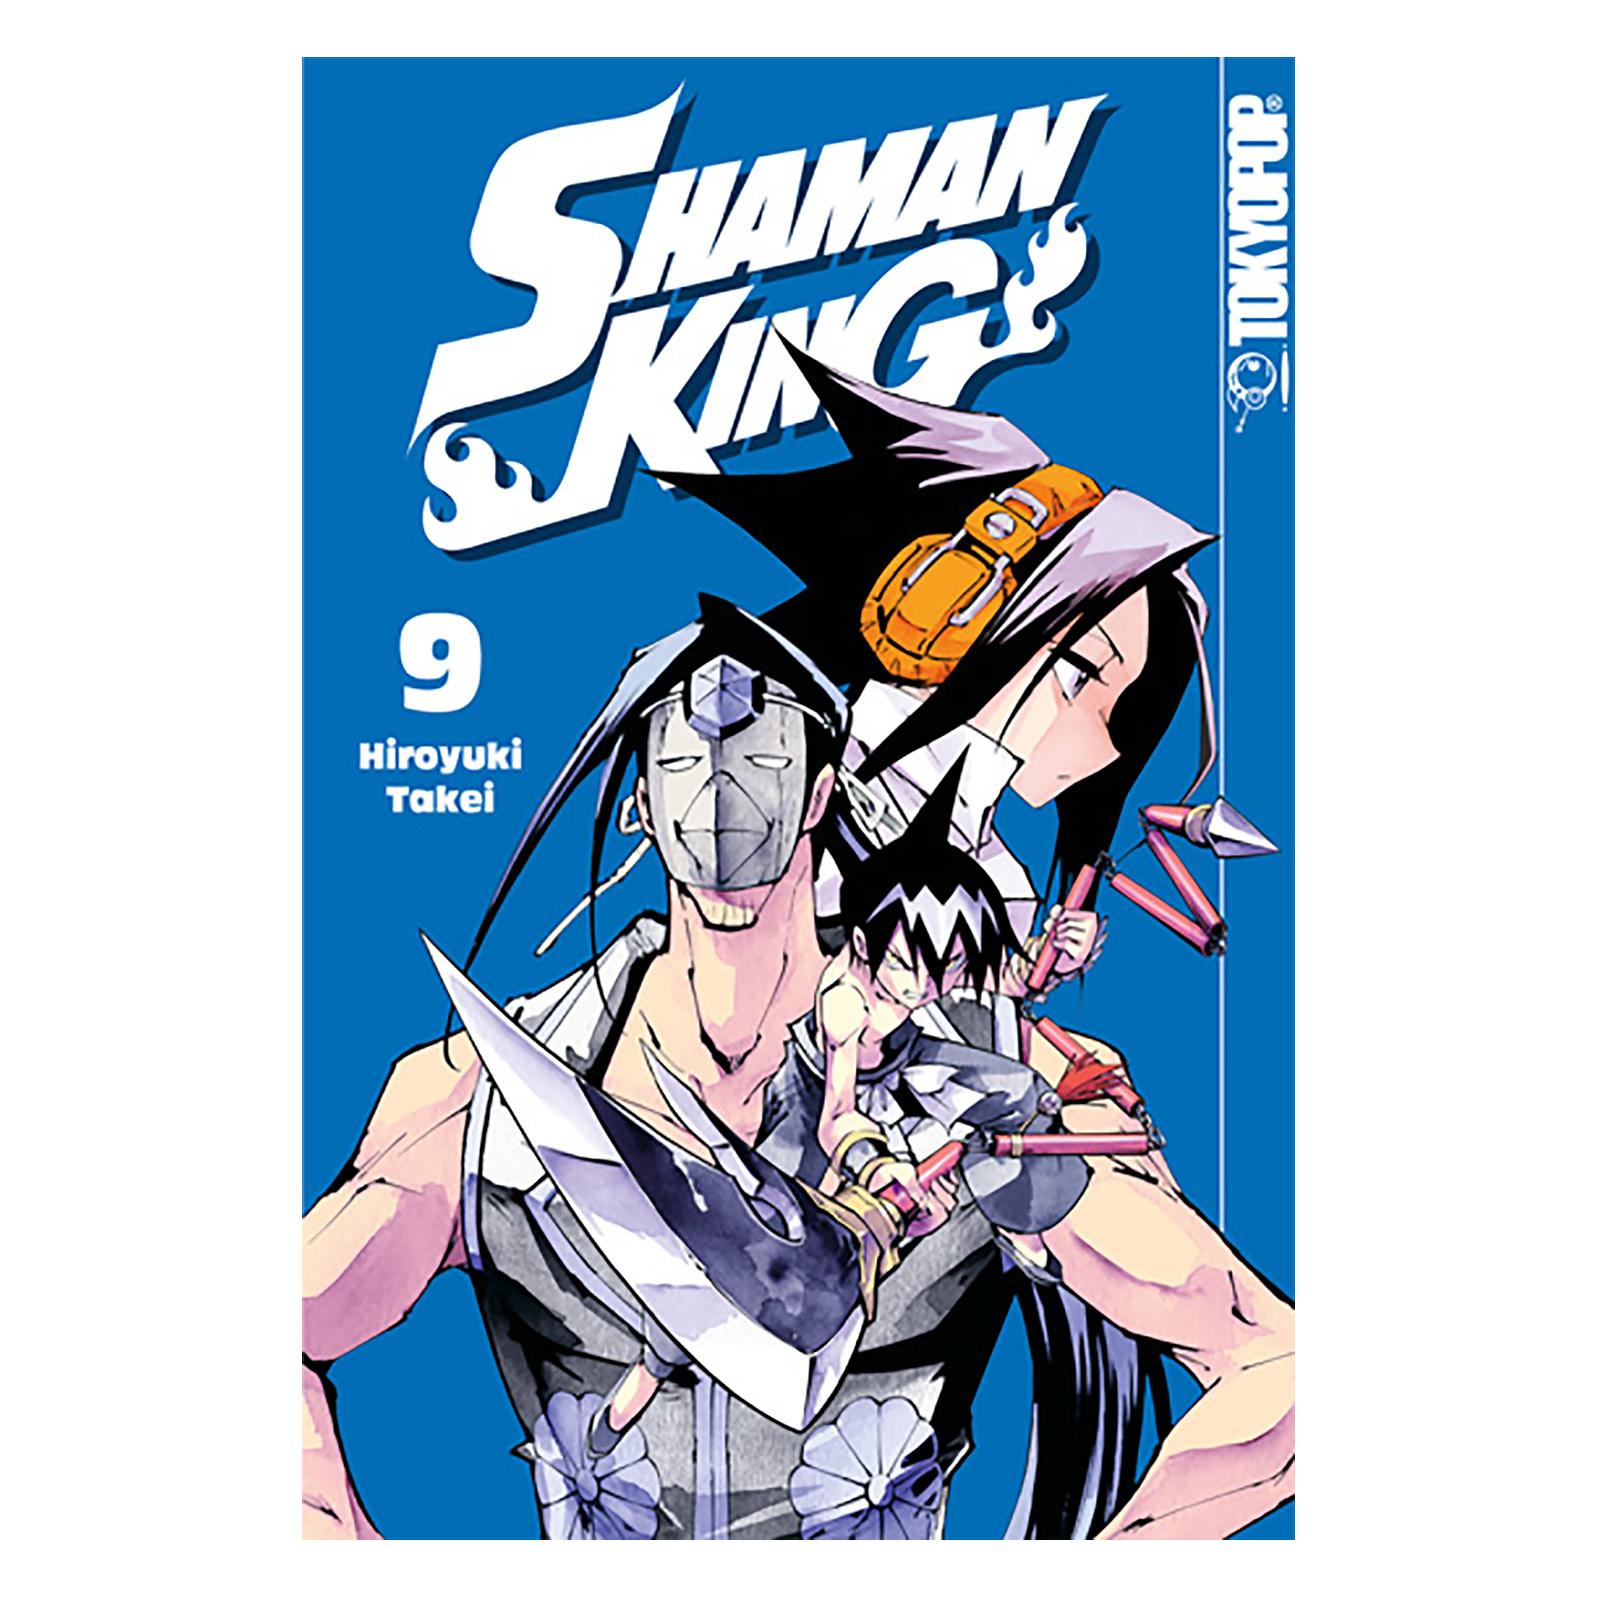 Shaman King - Band 9 Taschenbuch